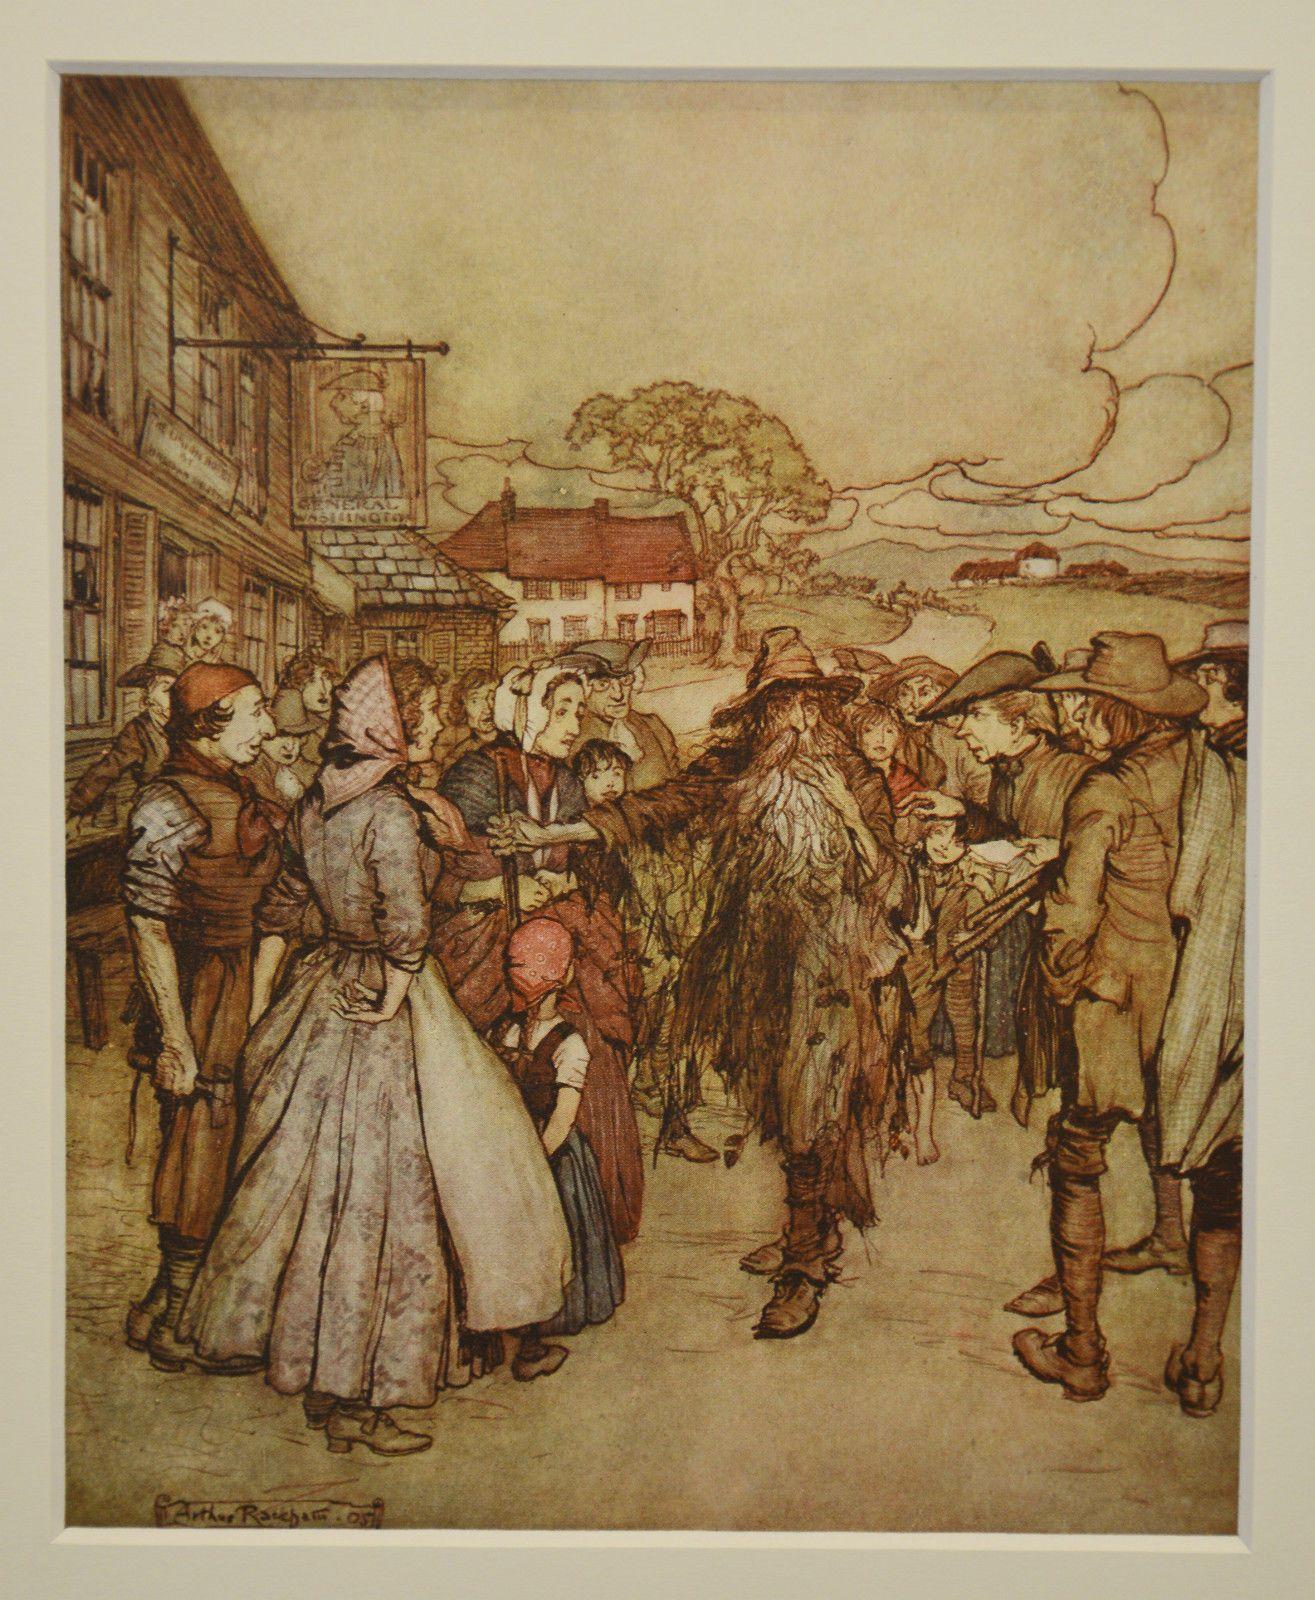 Arthur Rackham 'They Crowded Round Him' illustration, 1919 | eBay